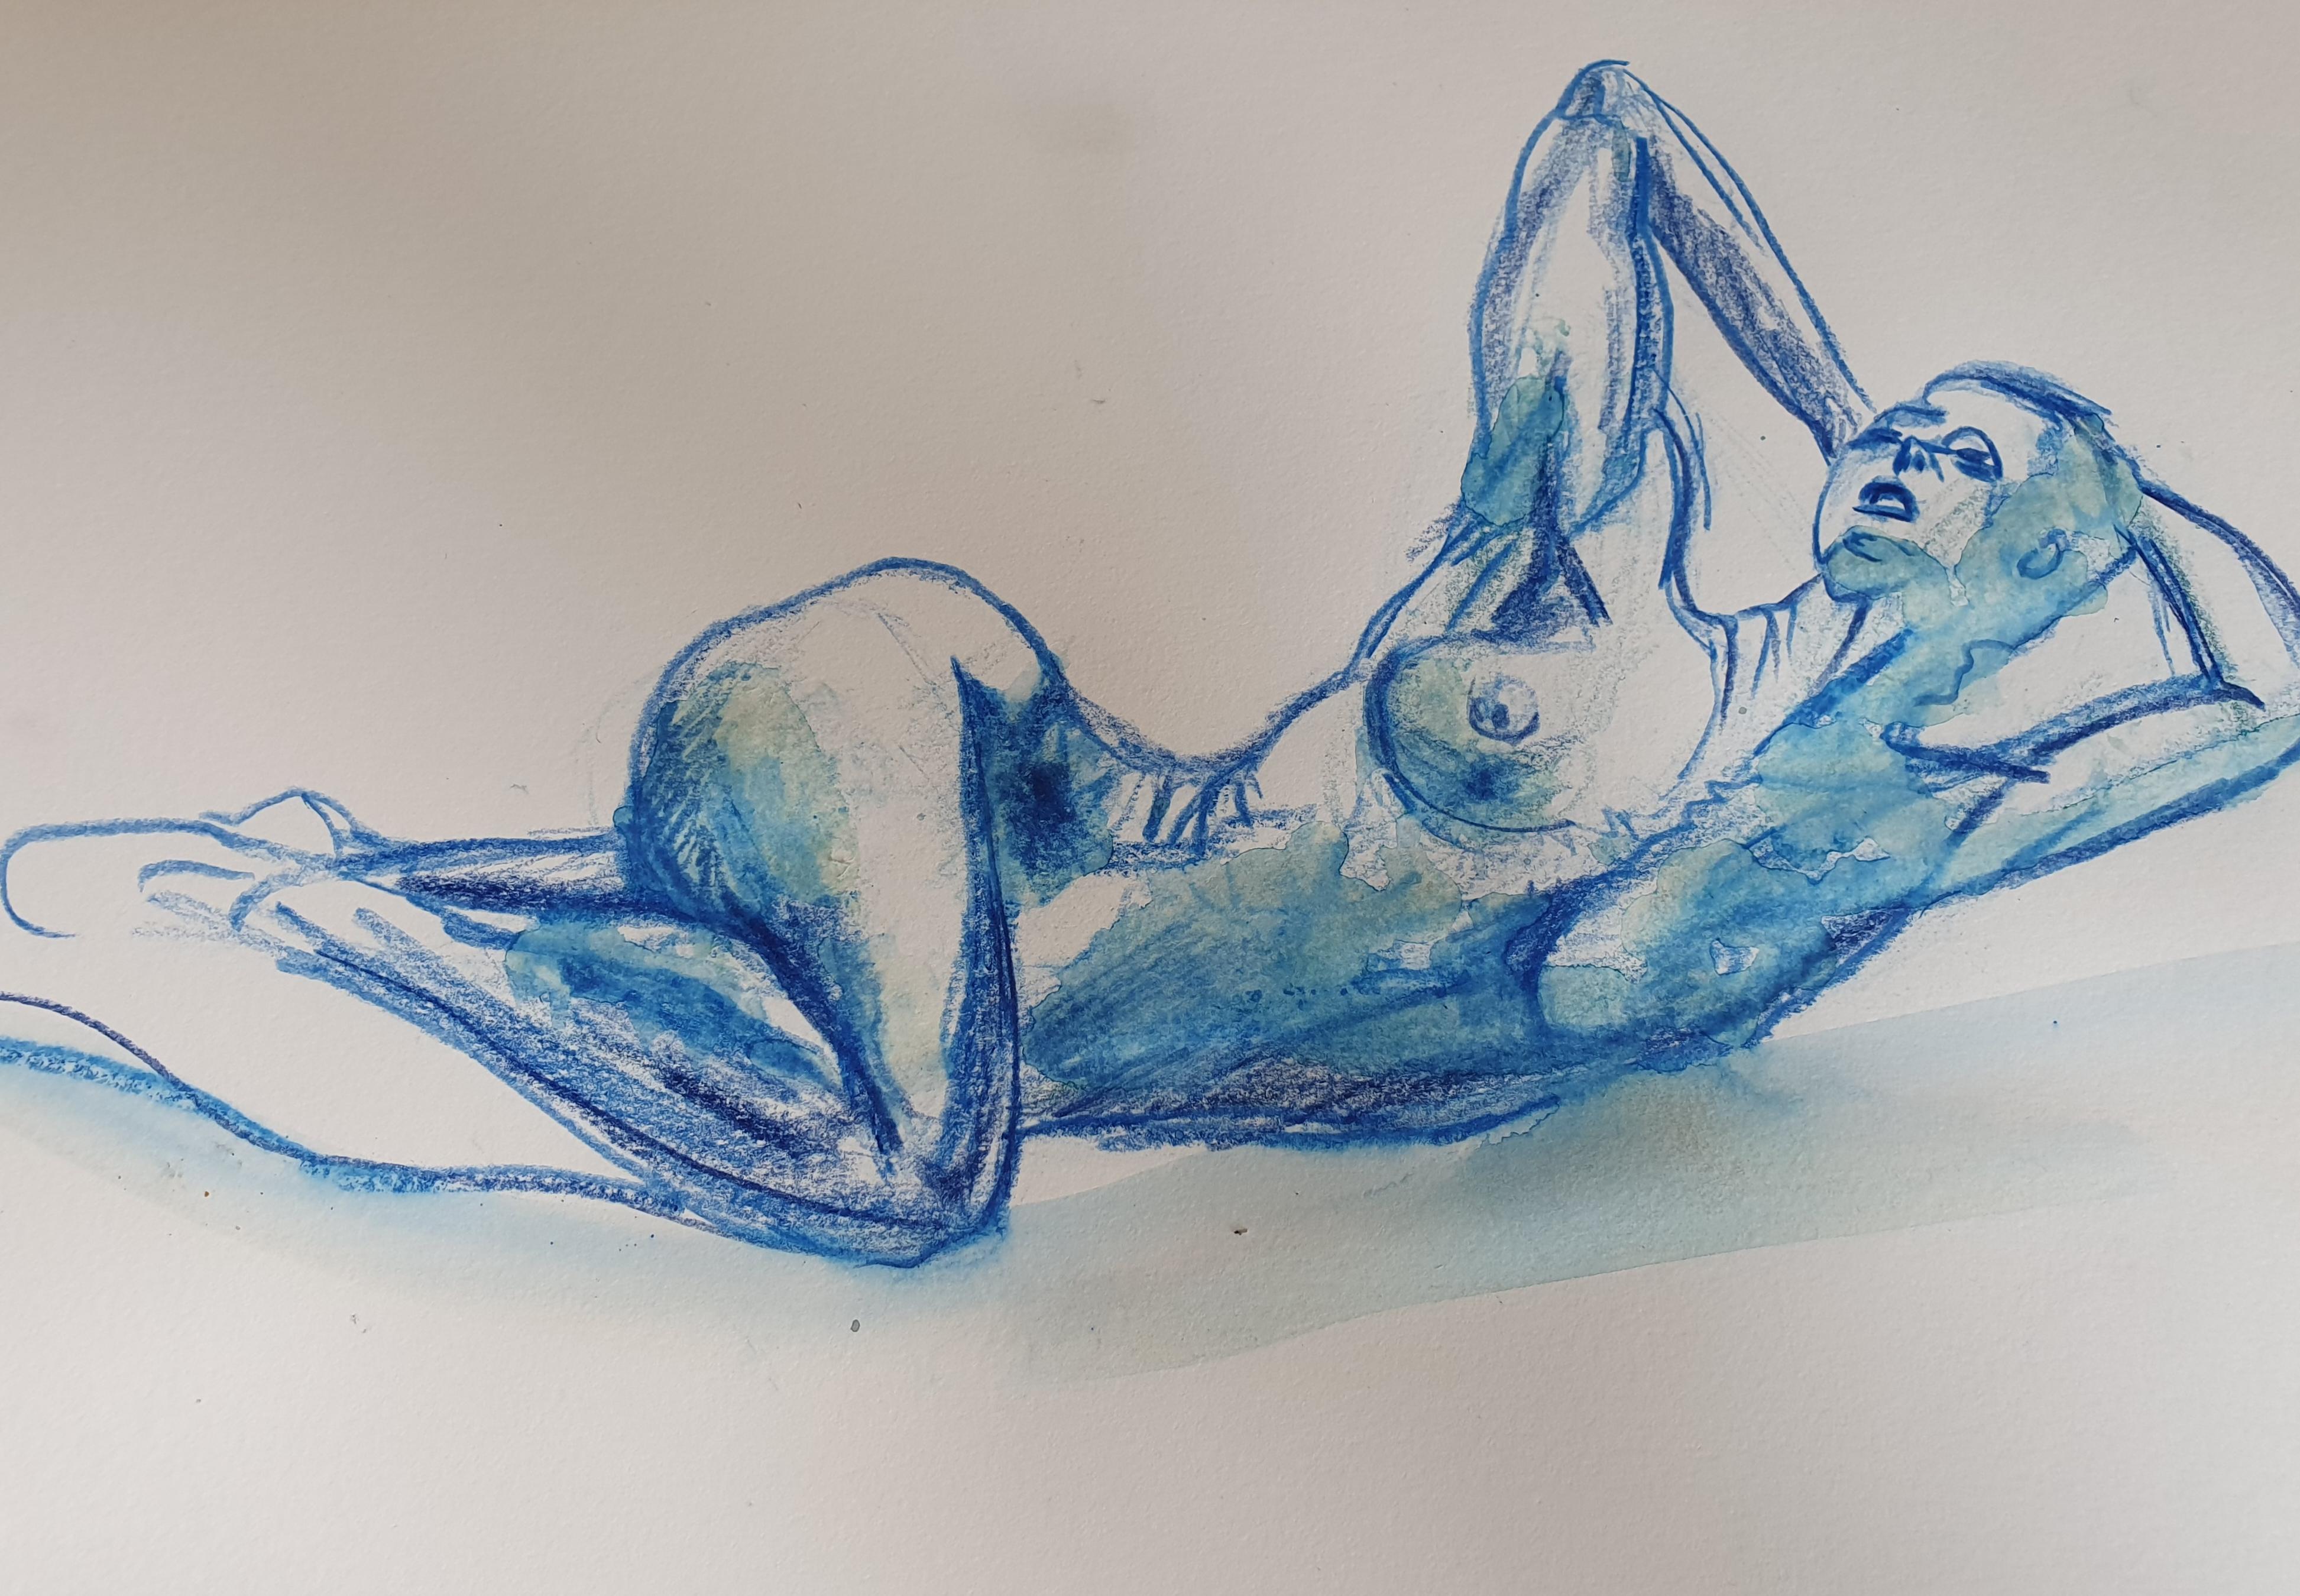 croquis de nu bleu allong�   cours de dessin